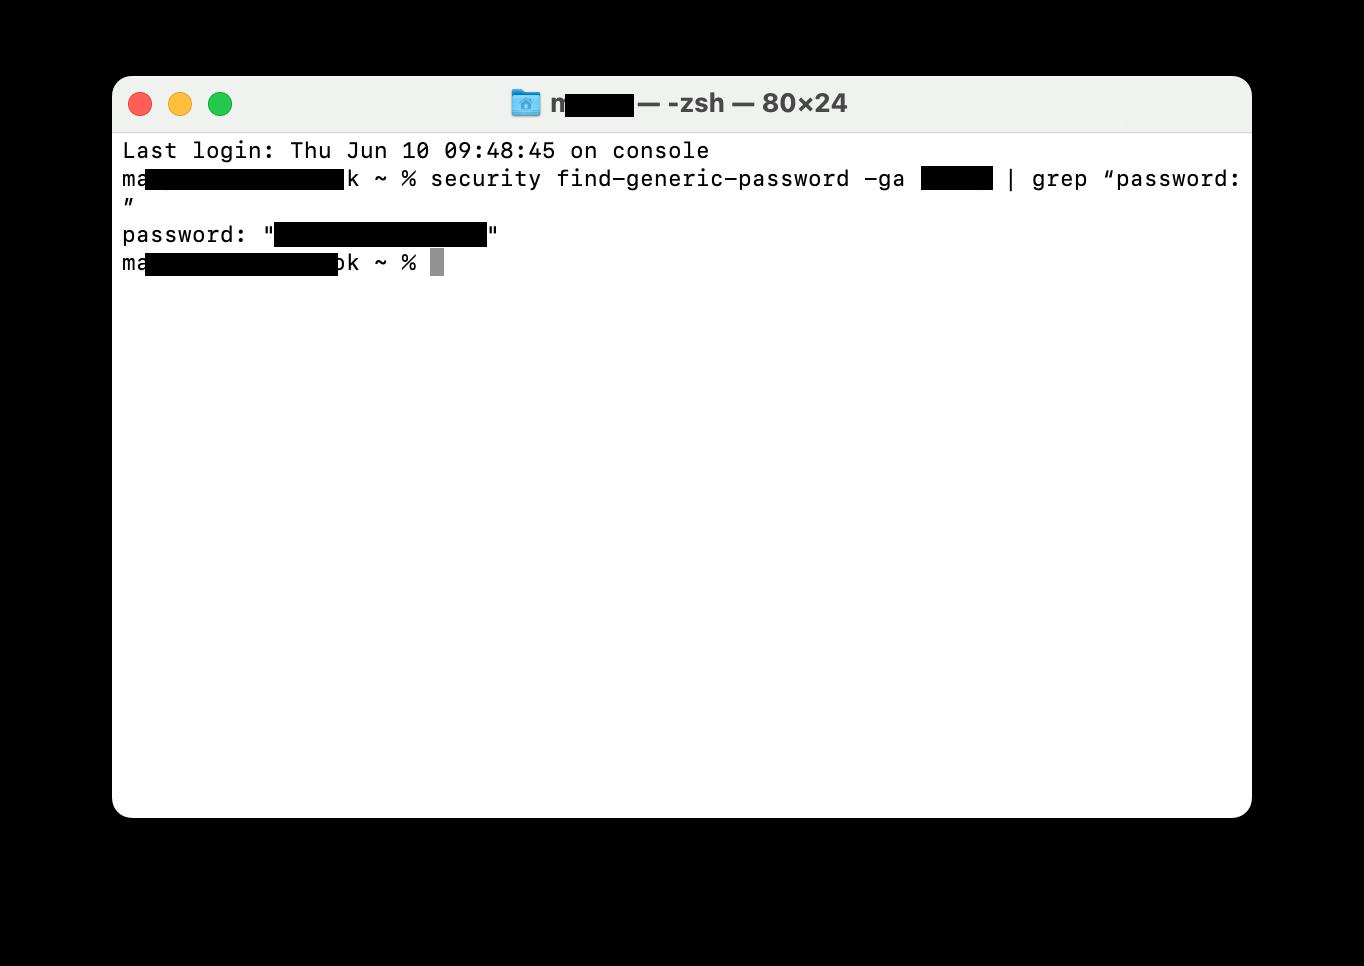 teminal wi-fi password